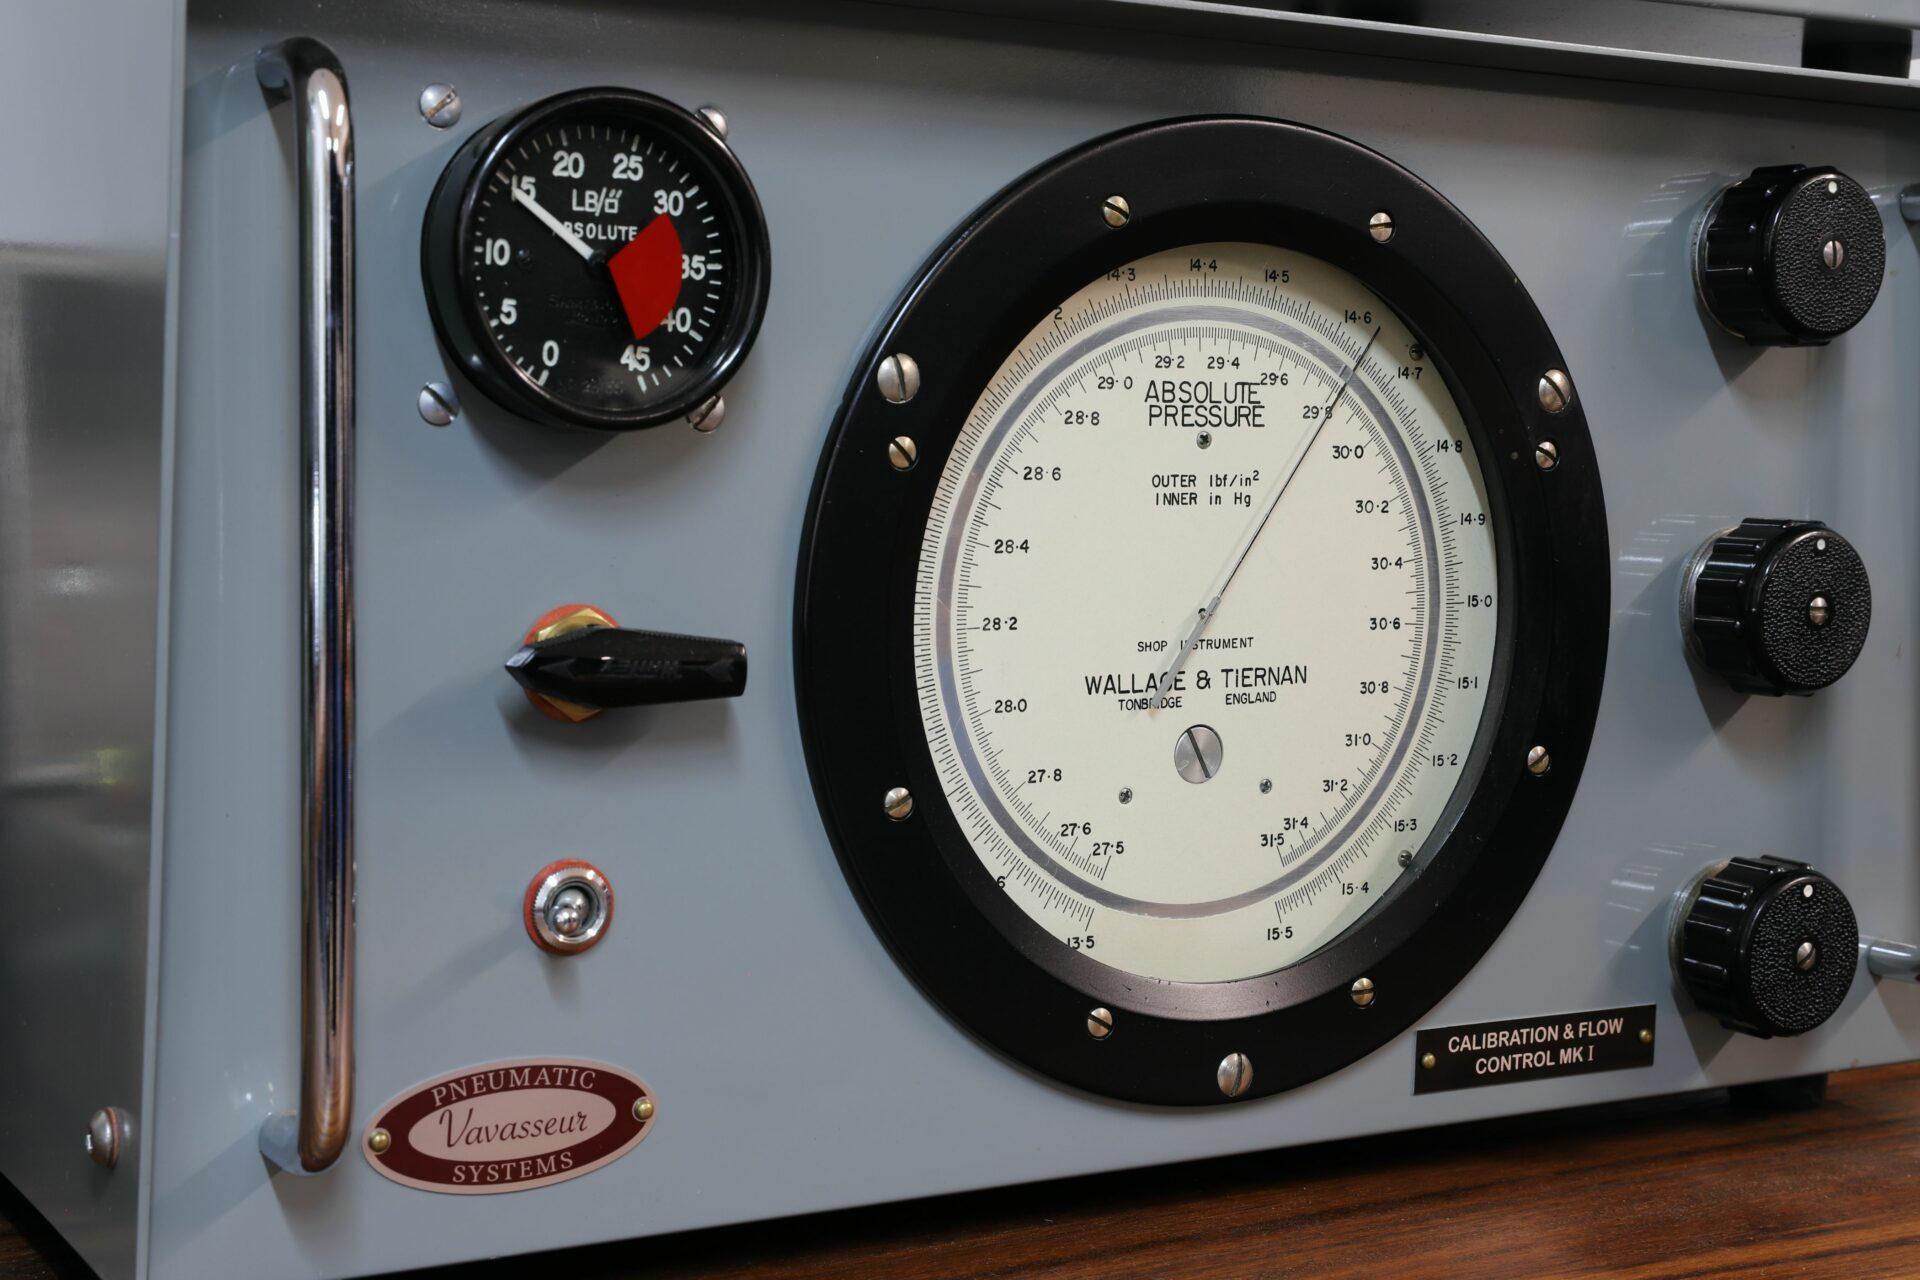 Close up of Vavasseur Laboratory Test Equipment Calibration & Flow Control MK I unit